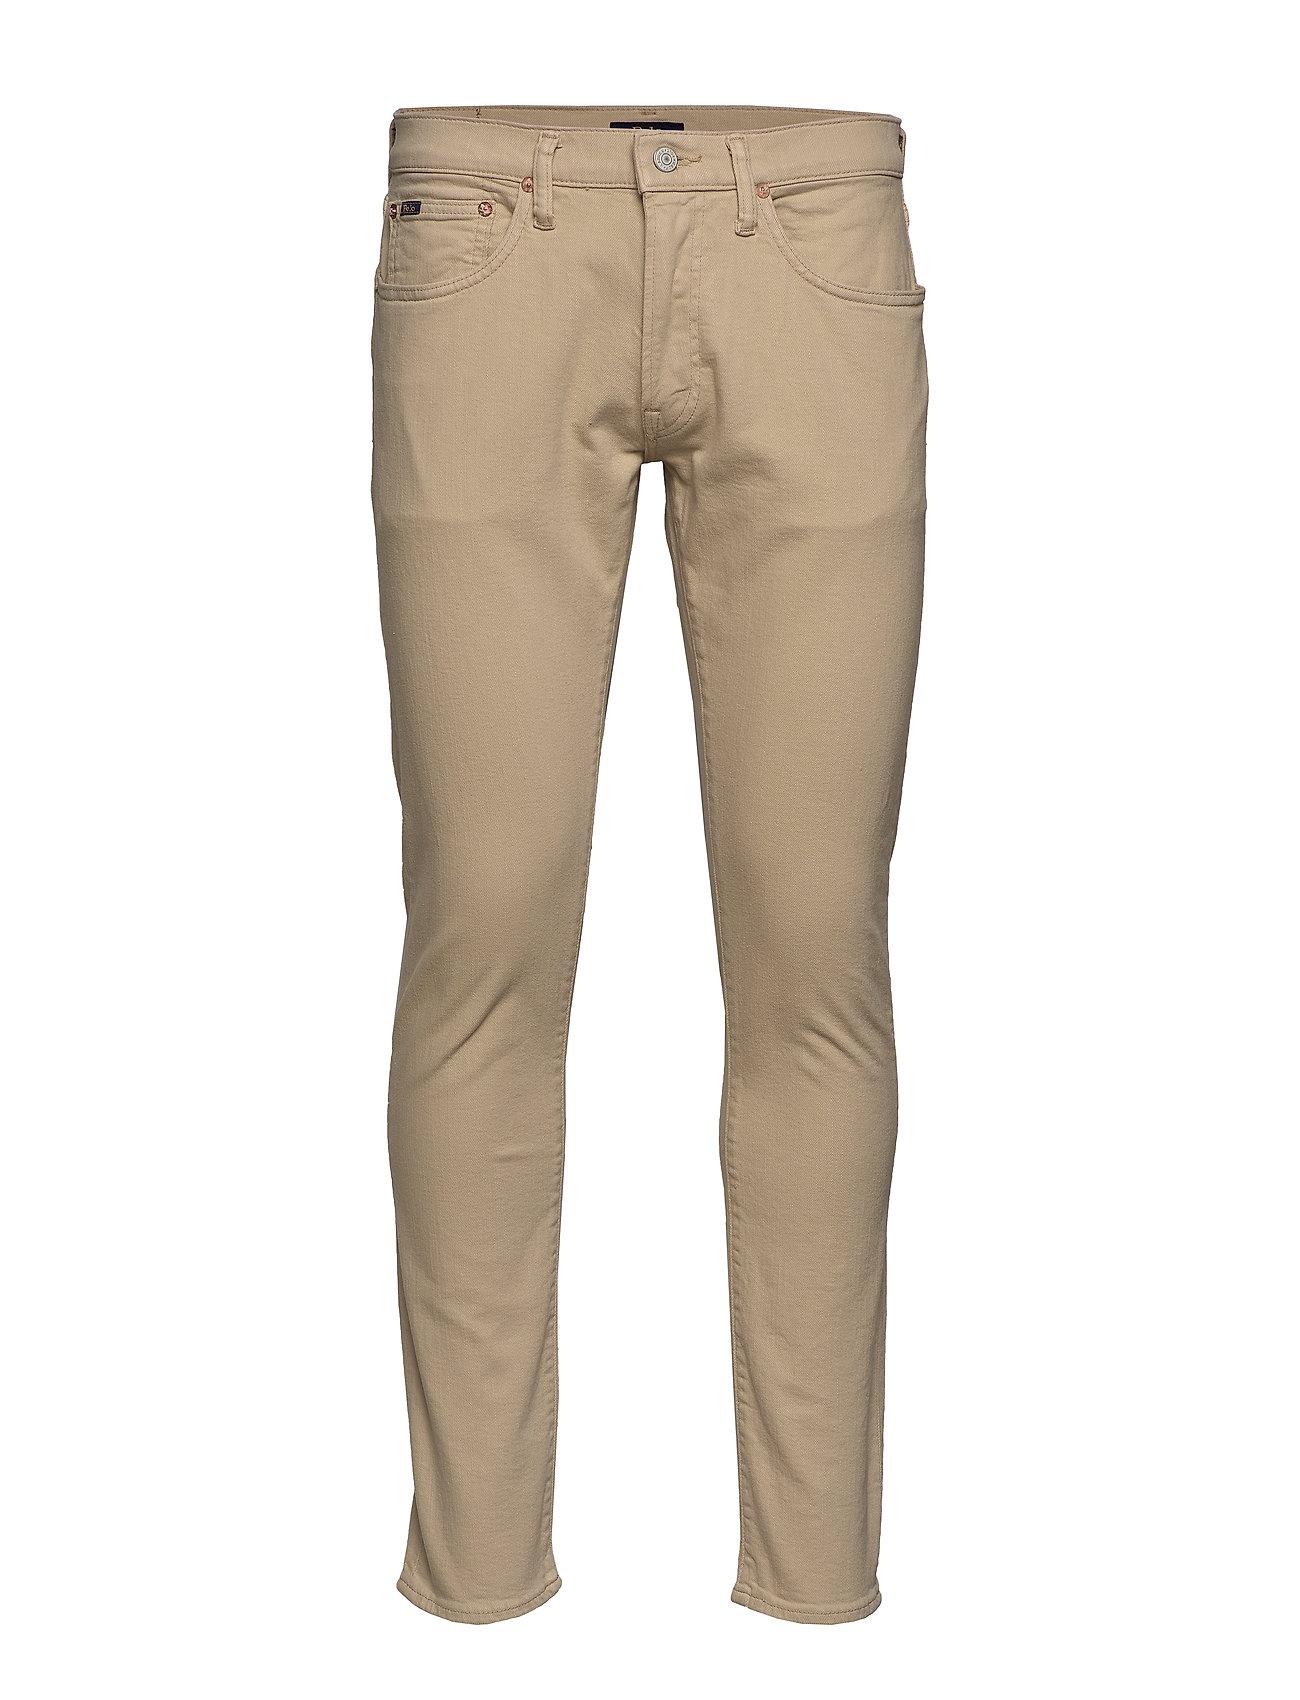 Polo Ralph Lauren Sullivan Slim Stretch Jean - HDN LIGHT KHAKI